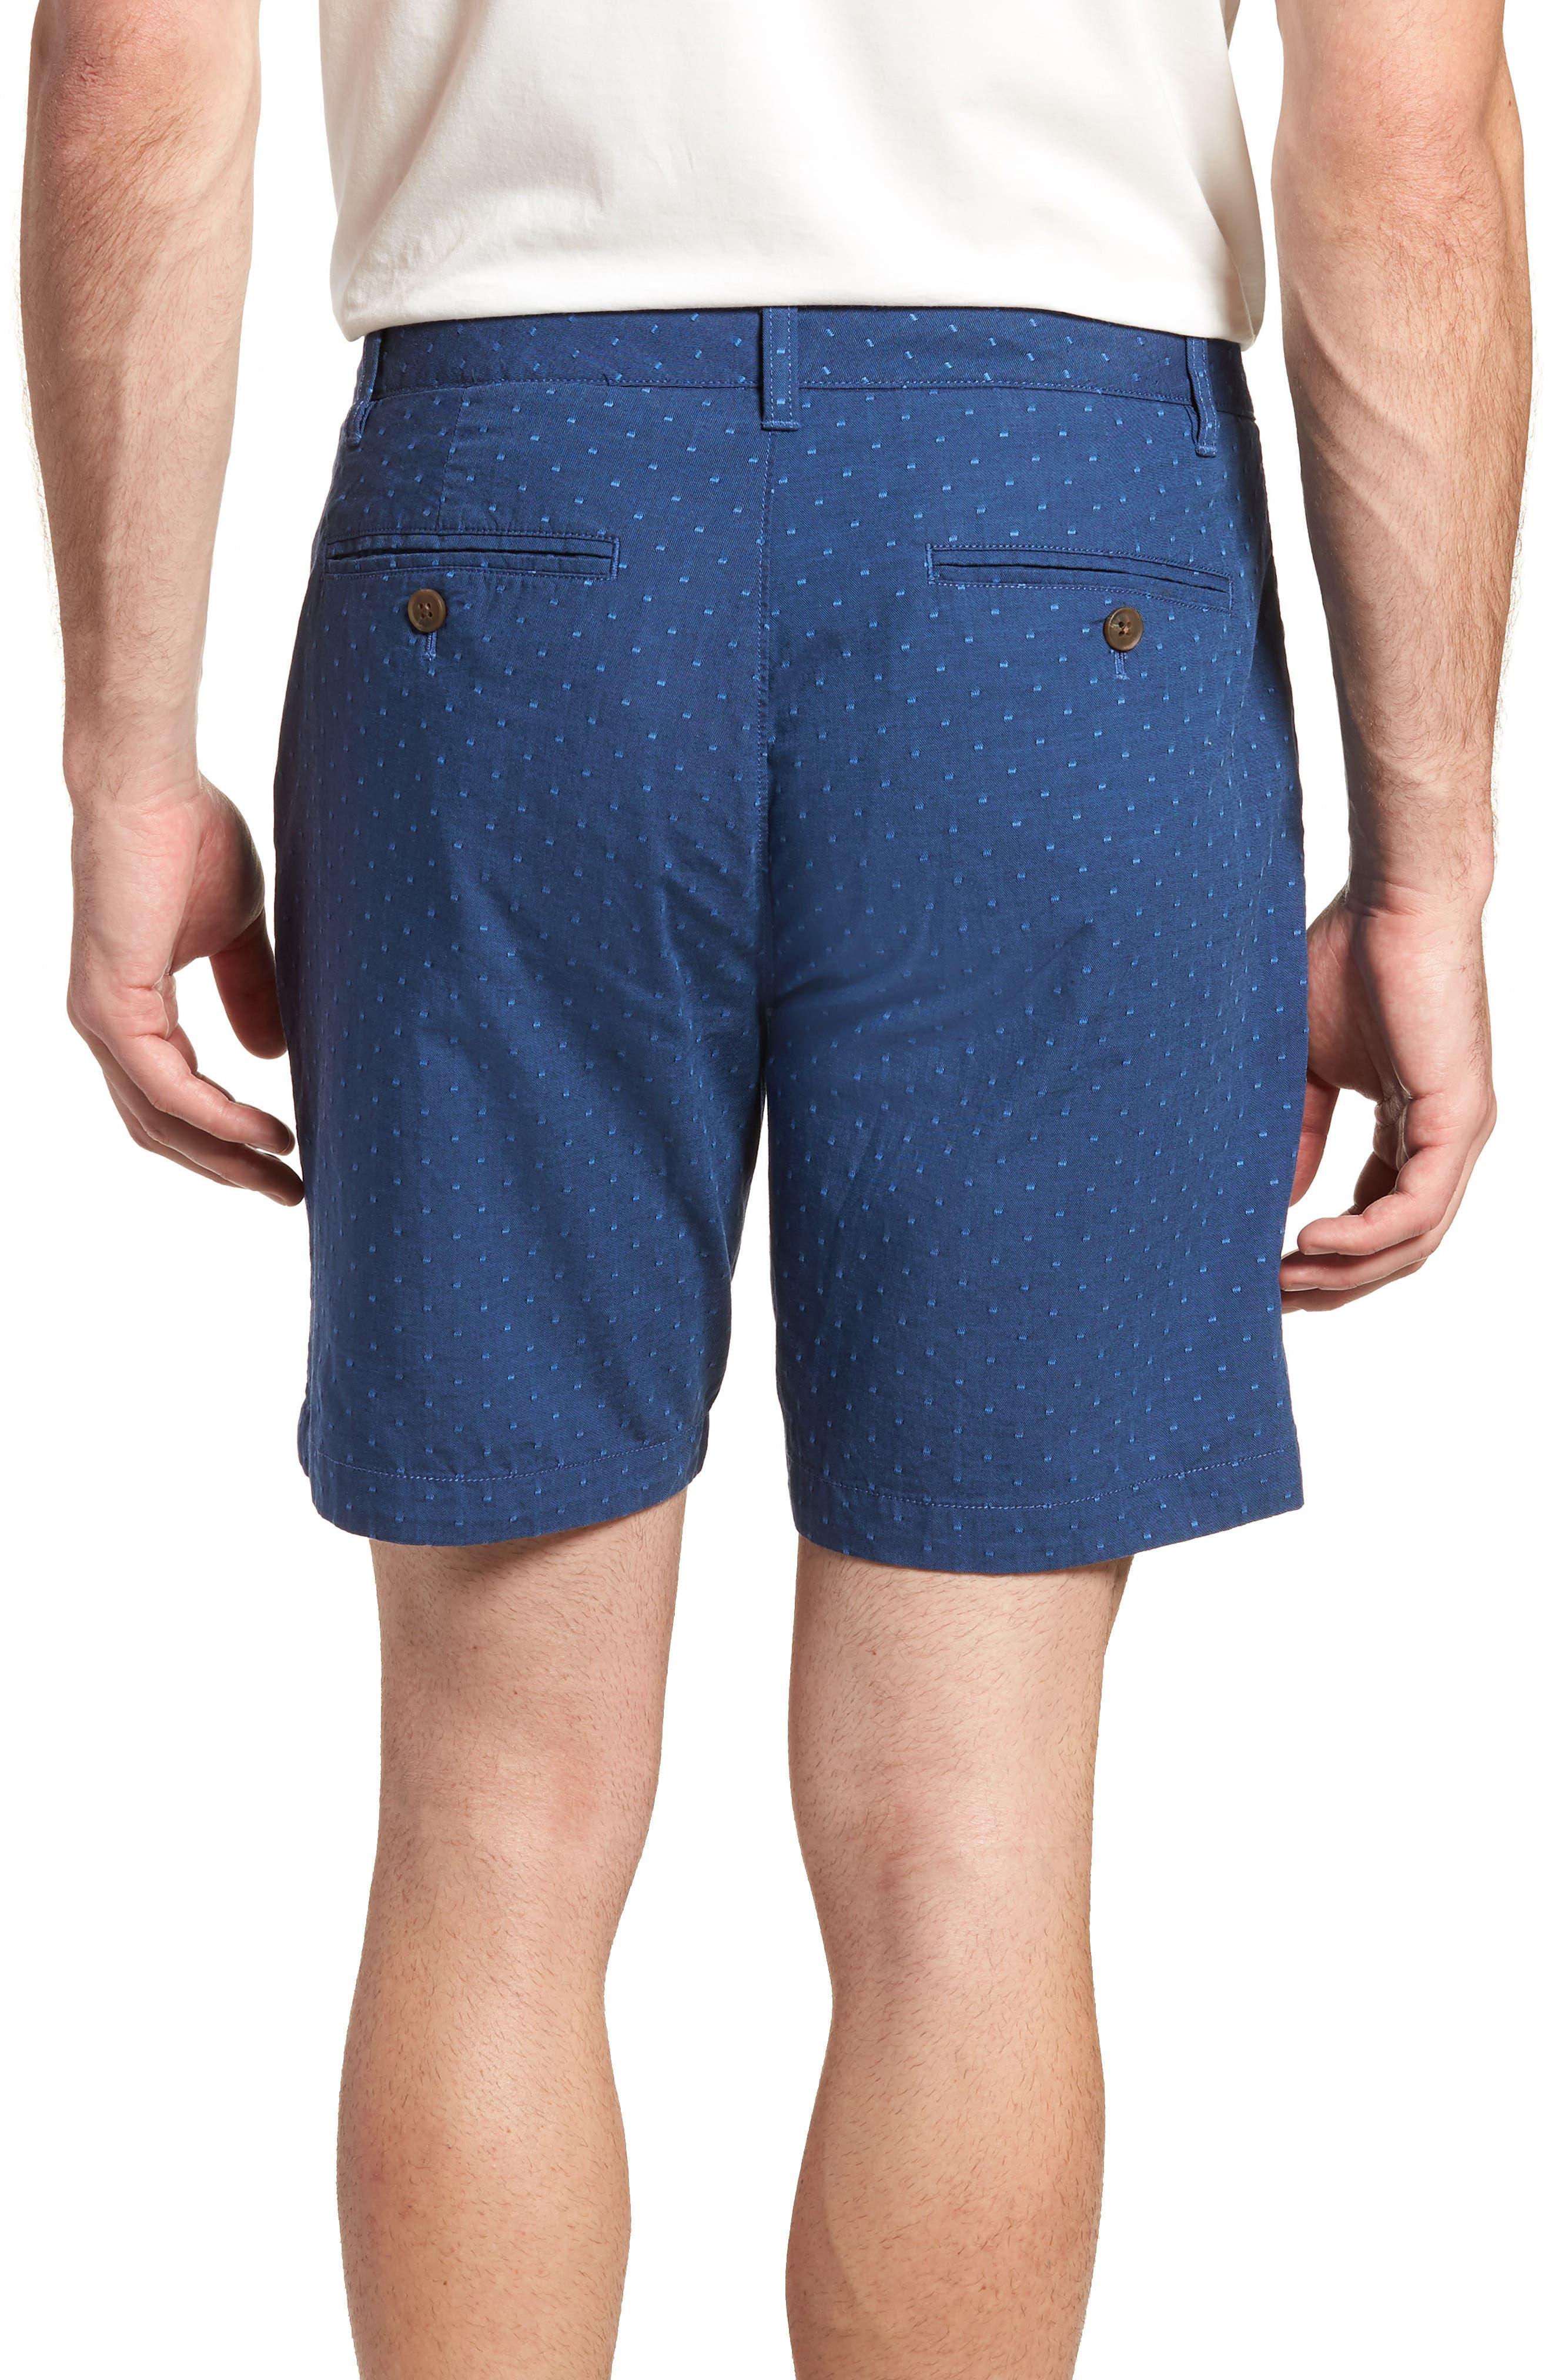 Novelty Chino Shorts,                             Alternate thumbnail 2, color,                             Blue Dot Jacquard